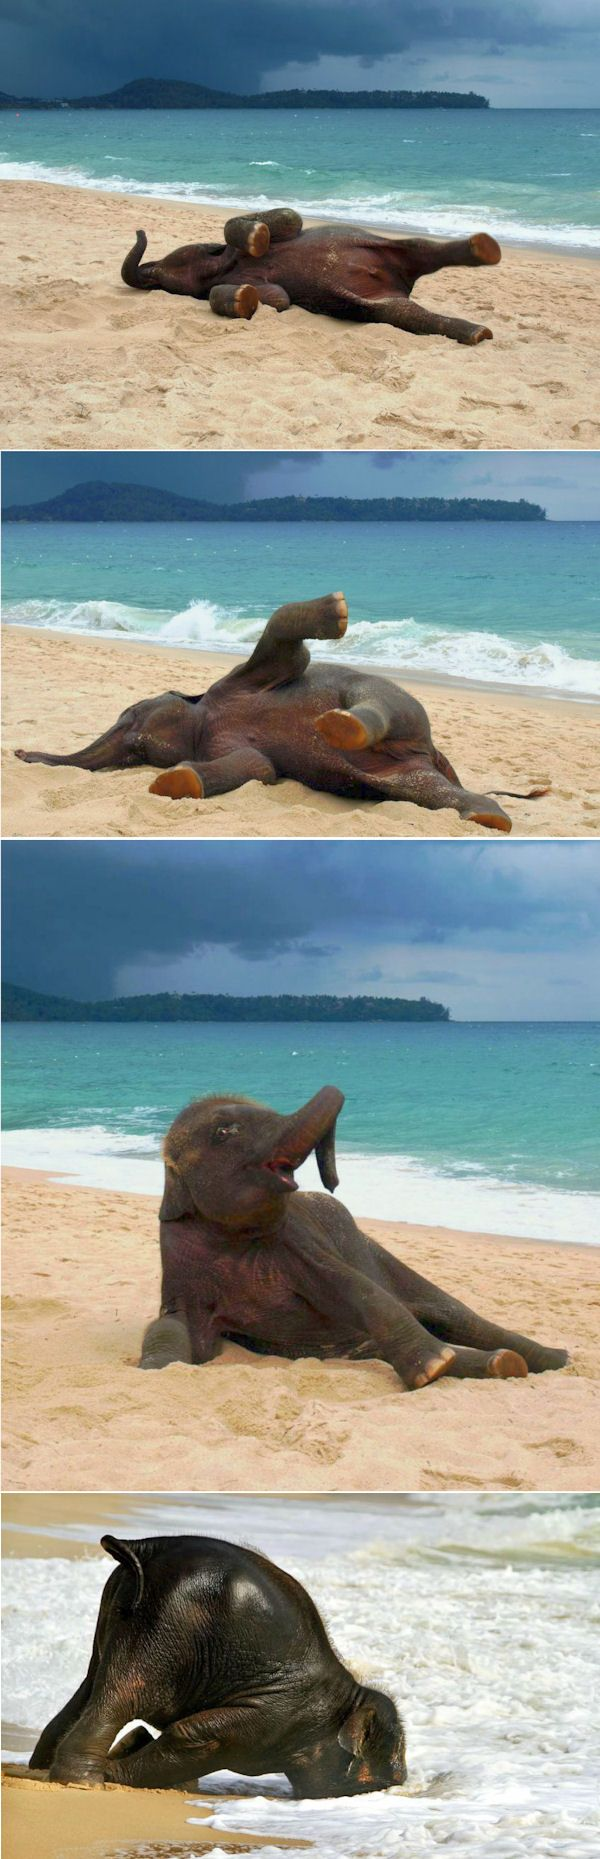 insolite eau elephant elephanteau plage sable                                                                                                                                                      More